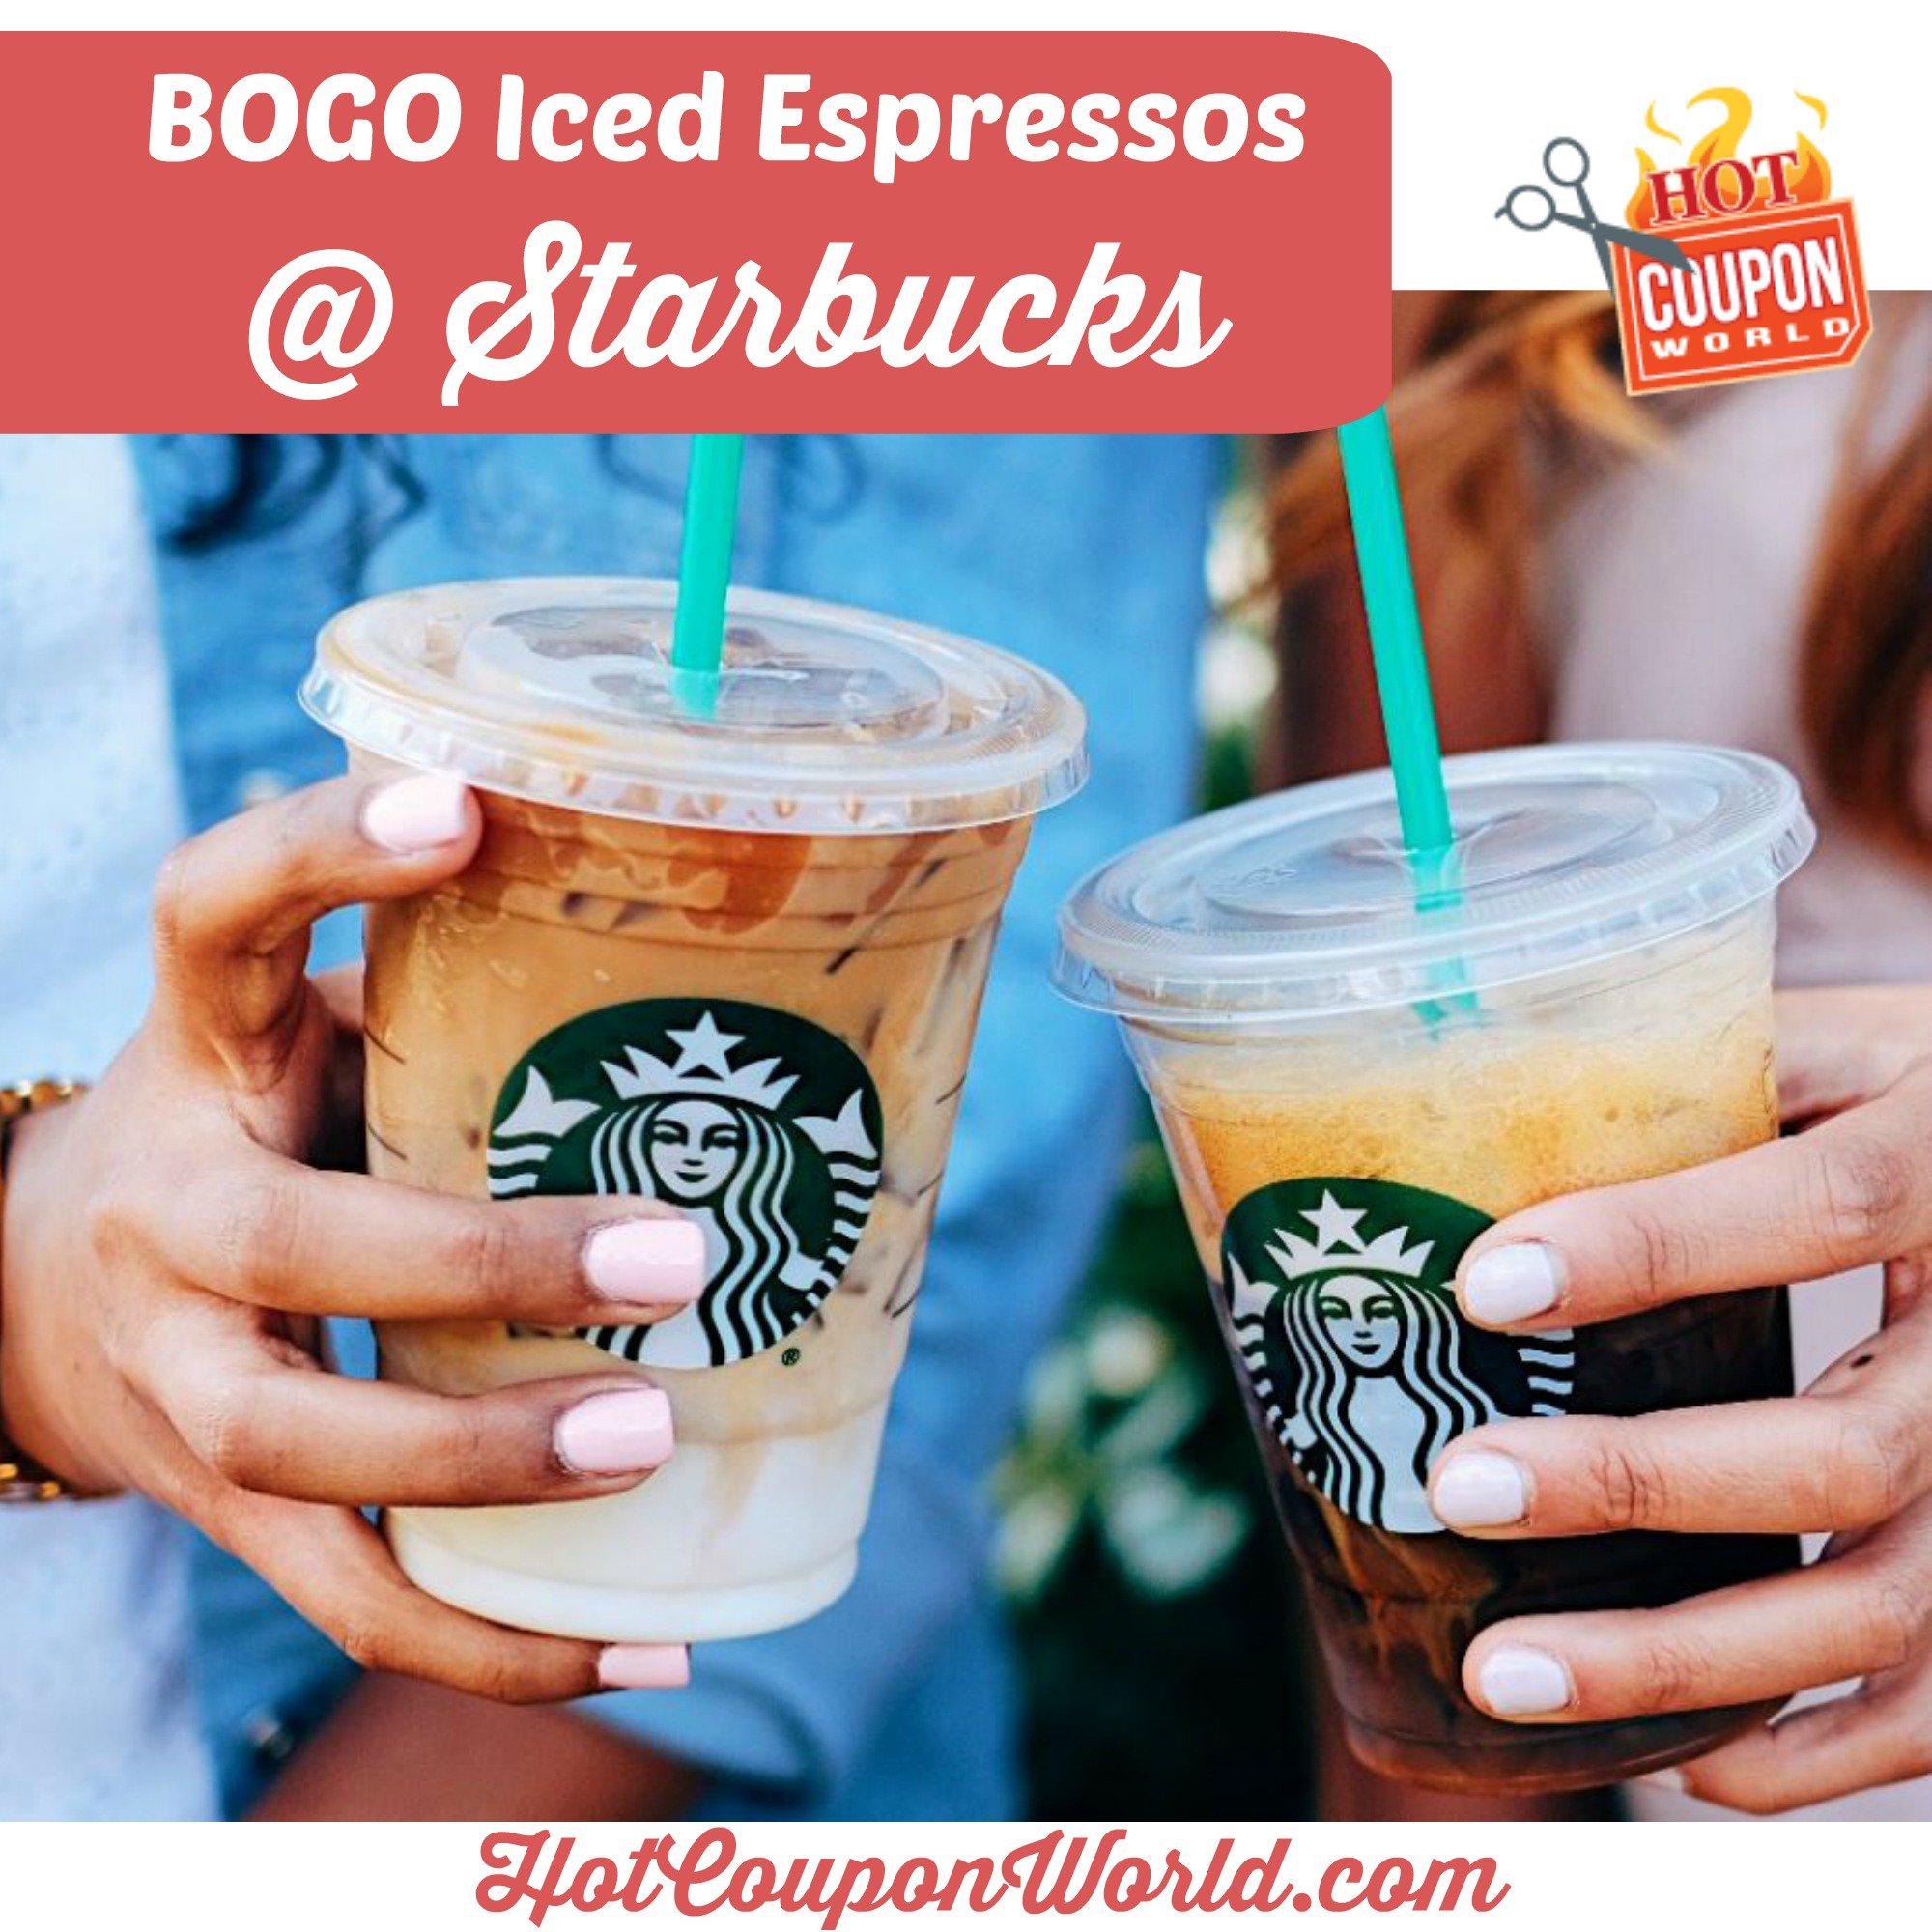 Starbucks Grande Iced Espresso: Bogo Free Event   Hot Coupon World - Free Starbucks Coupon Printable